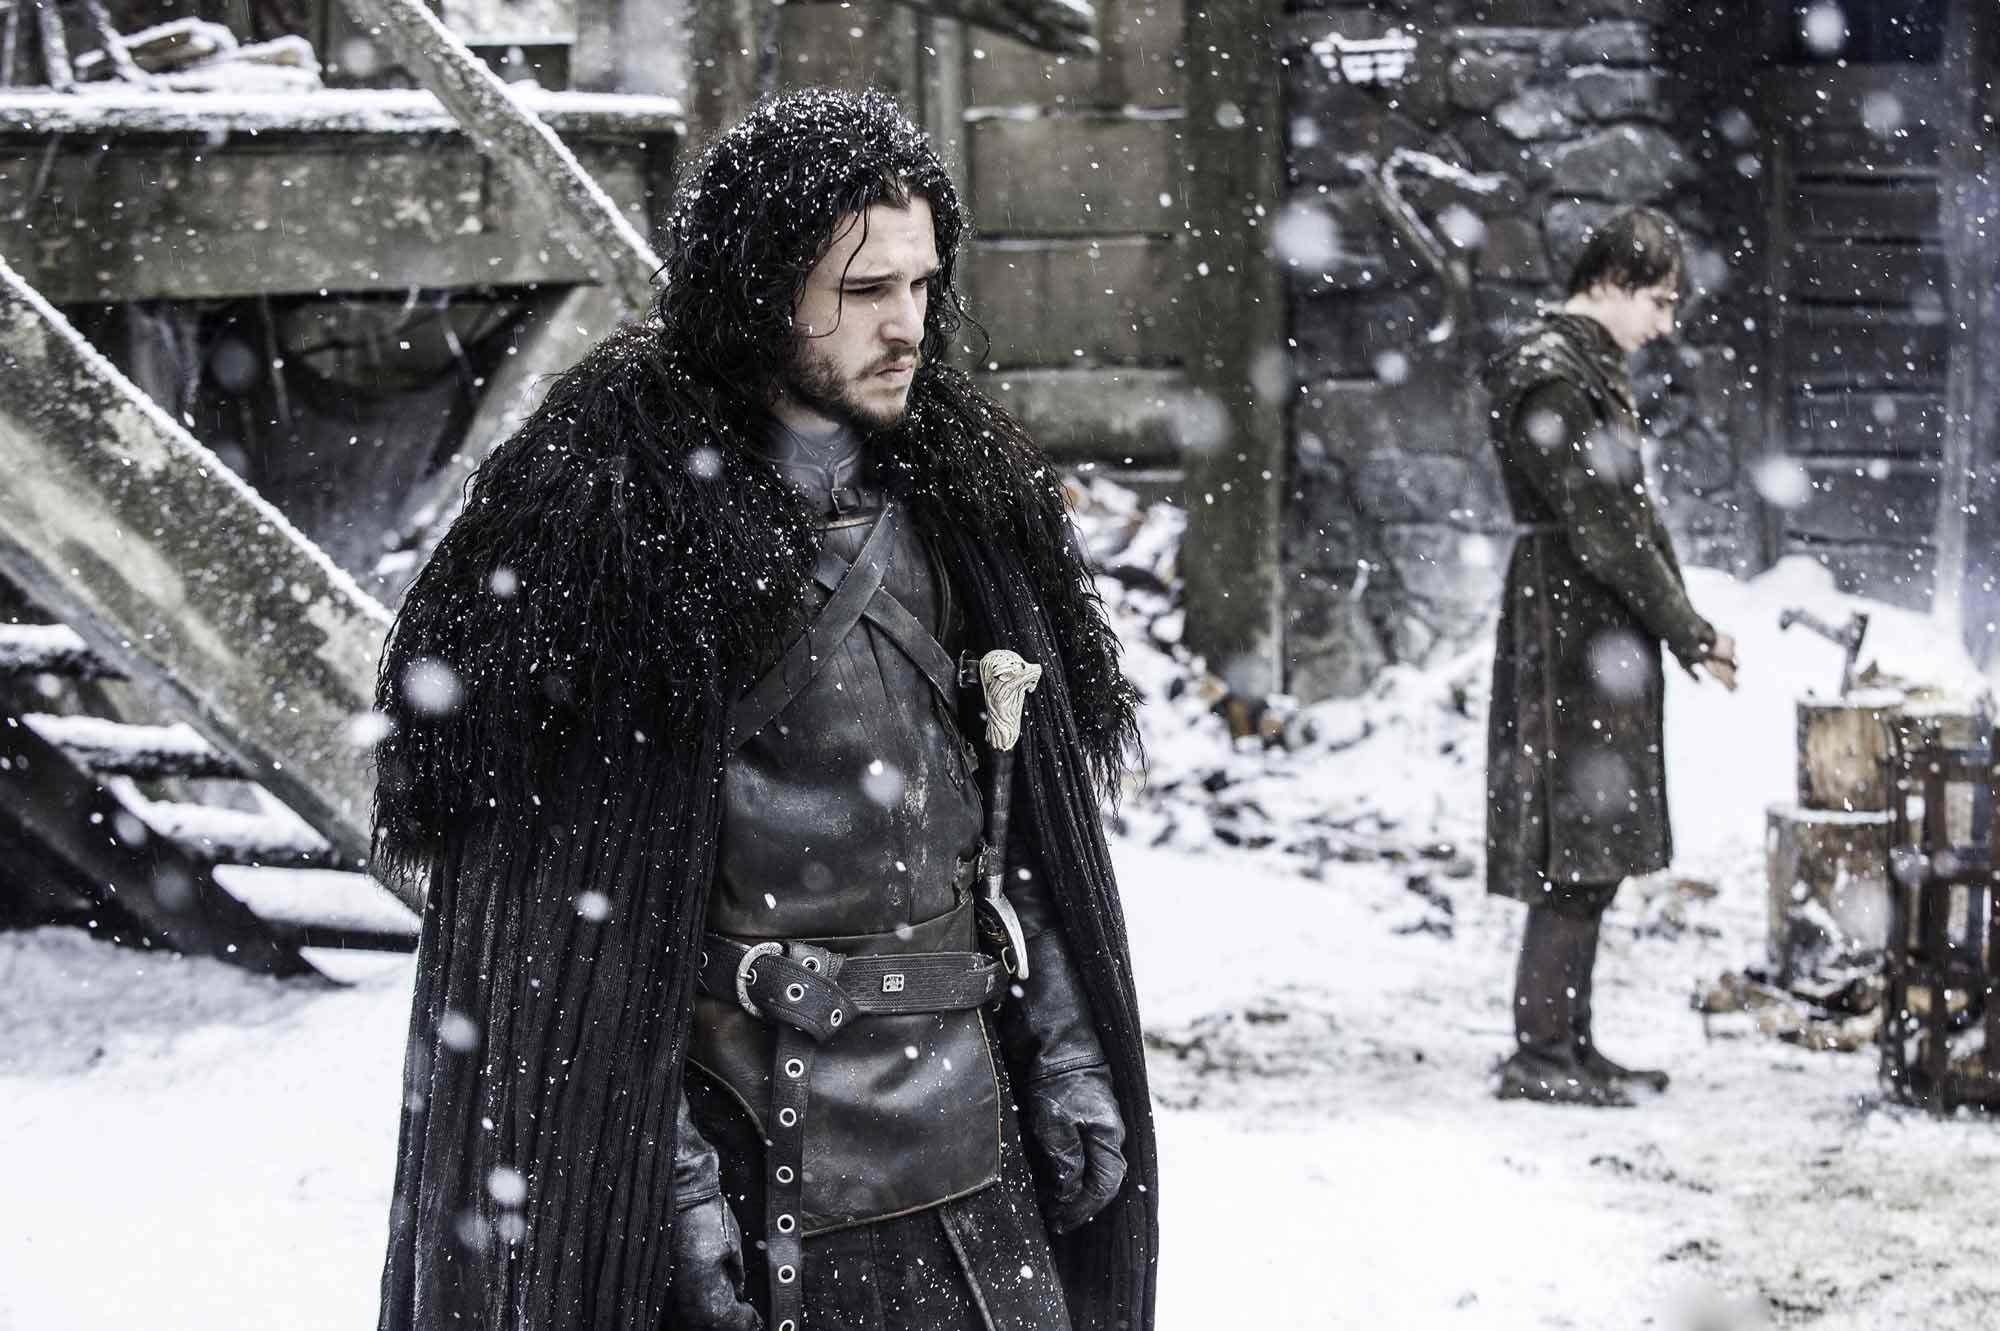 jon snow looking sad game of thrones helen sloan hbo.jpeg